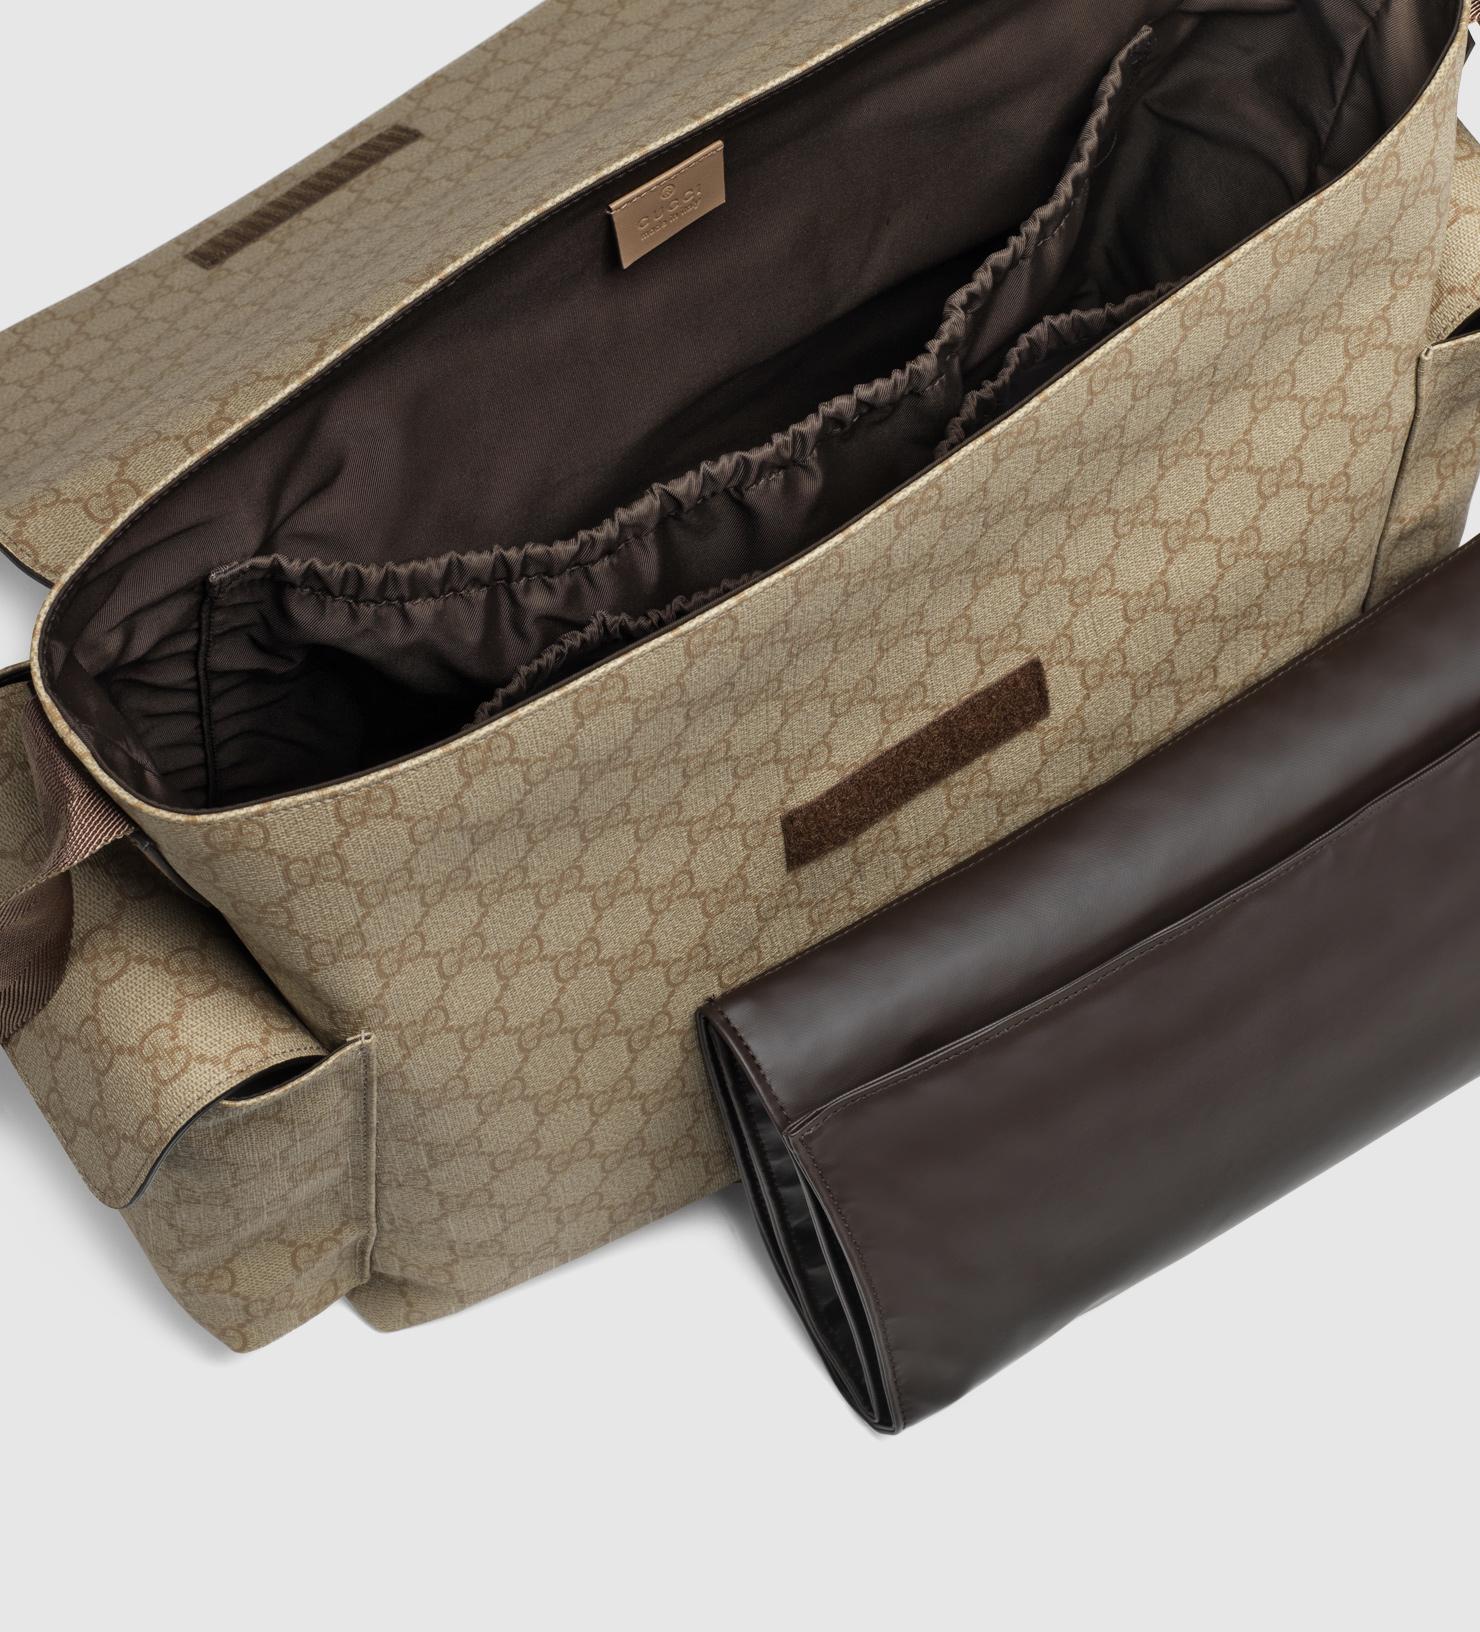 e34153ba2a0a34 Lyst - Gucci Gg Supreme Canvas Messenger Diaper Bag in Brown